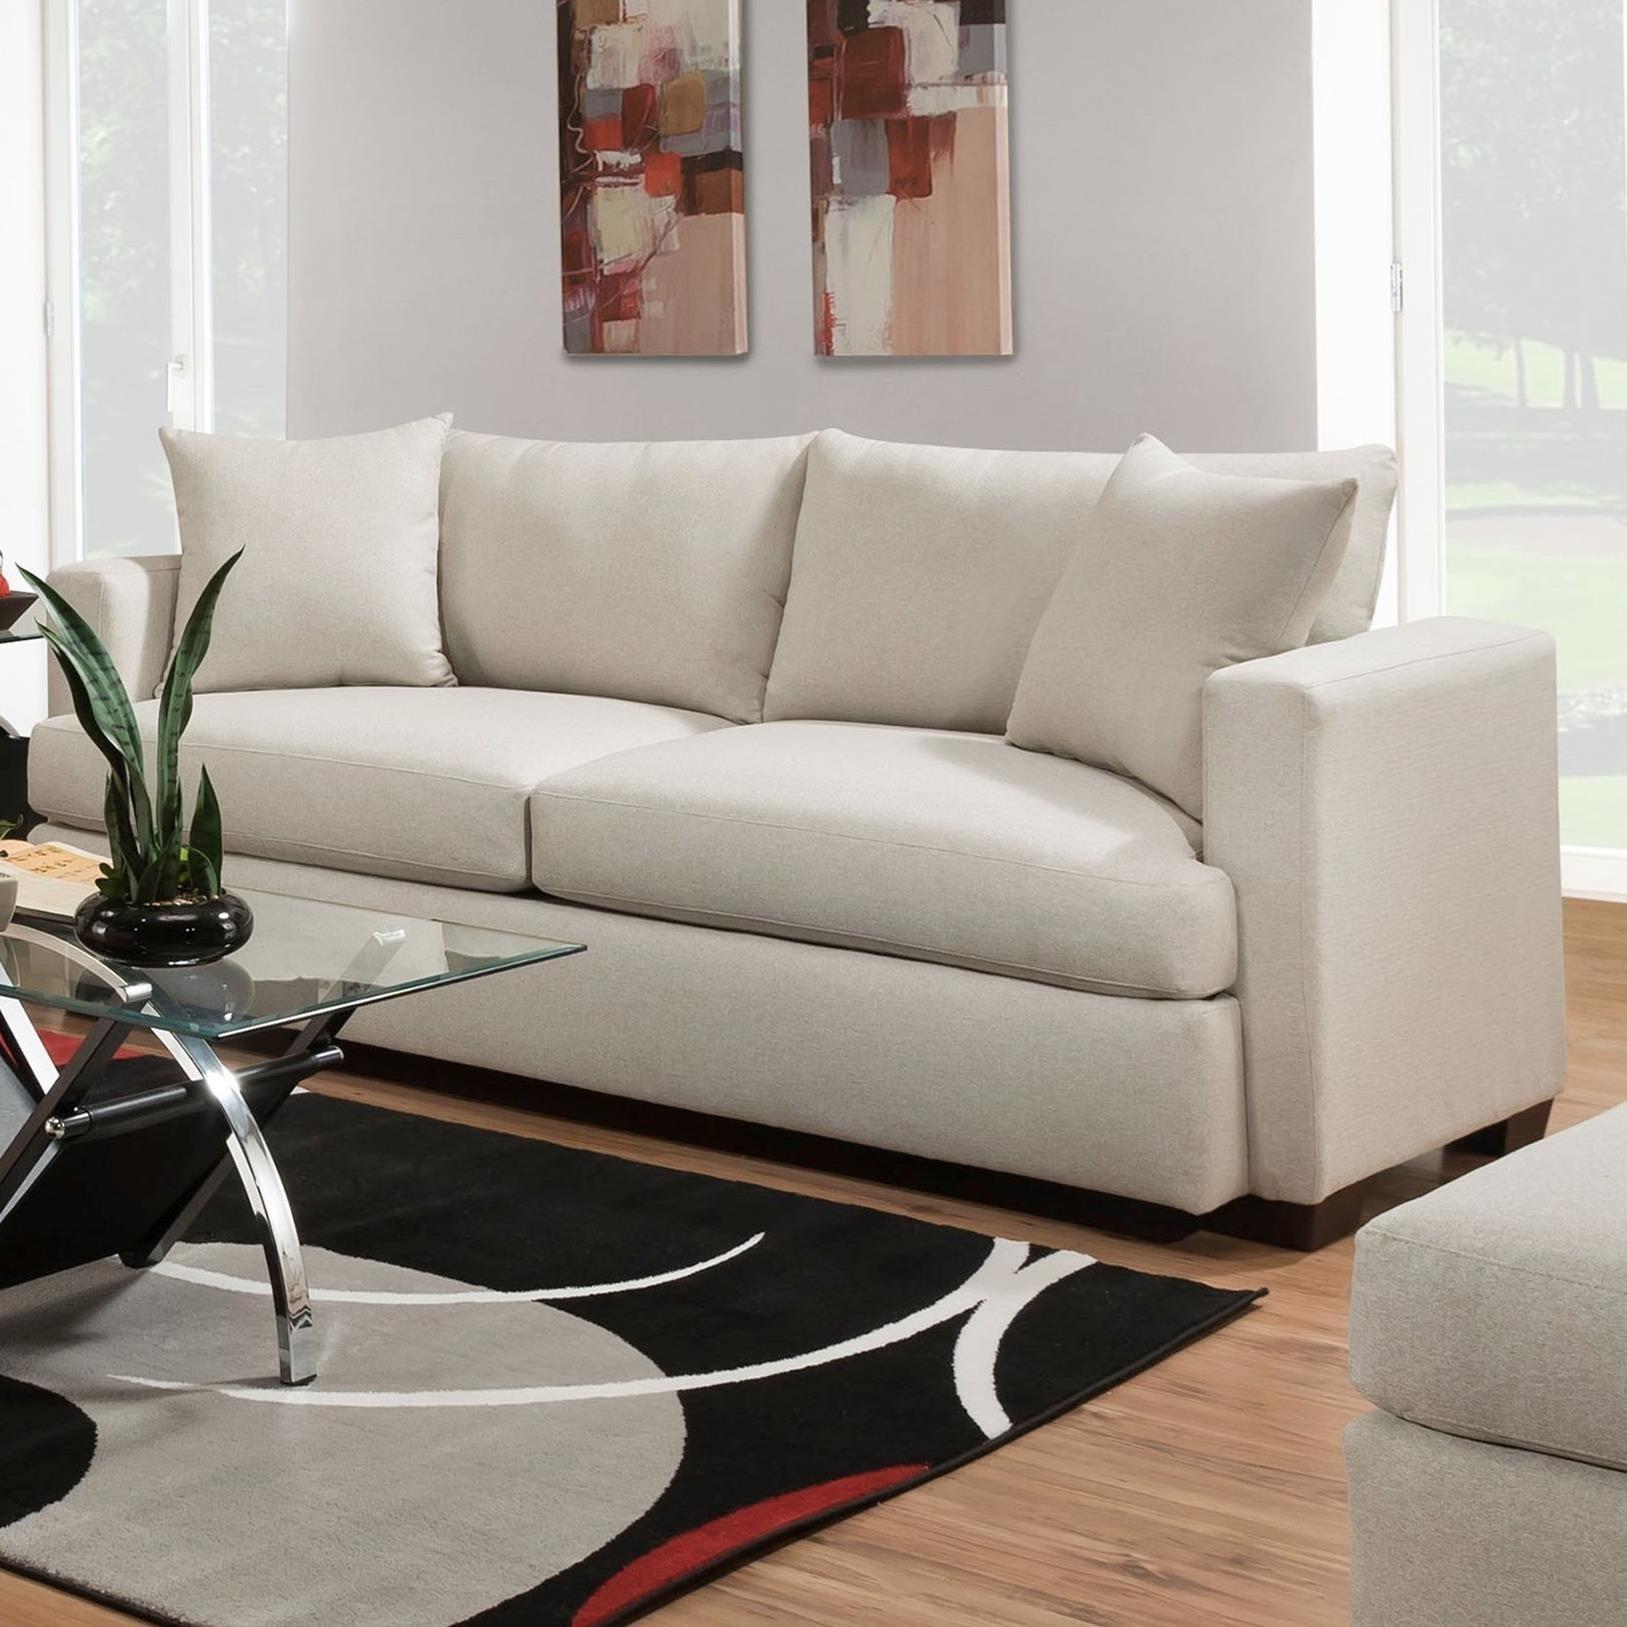 5300 Sleeper by Peak Living at Prime Brothers Furniture